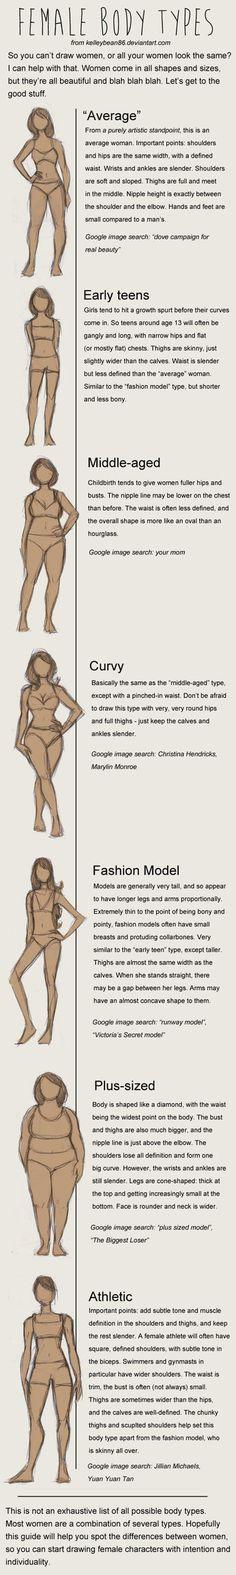 Draw Female Body Types by kelleybean86 on deviantART